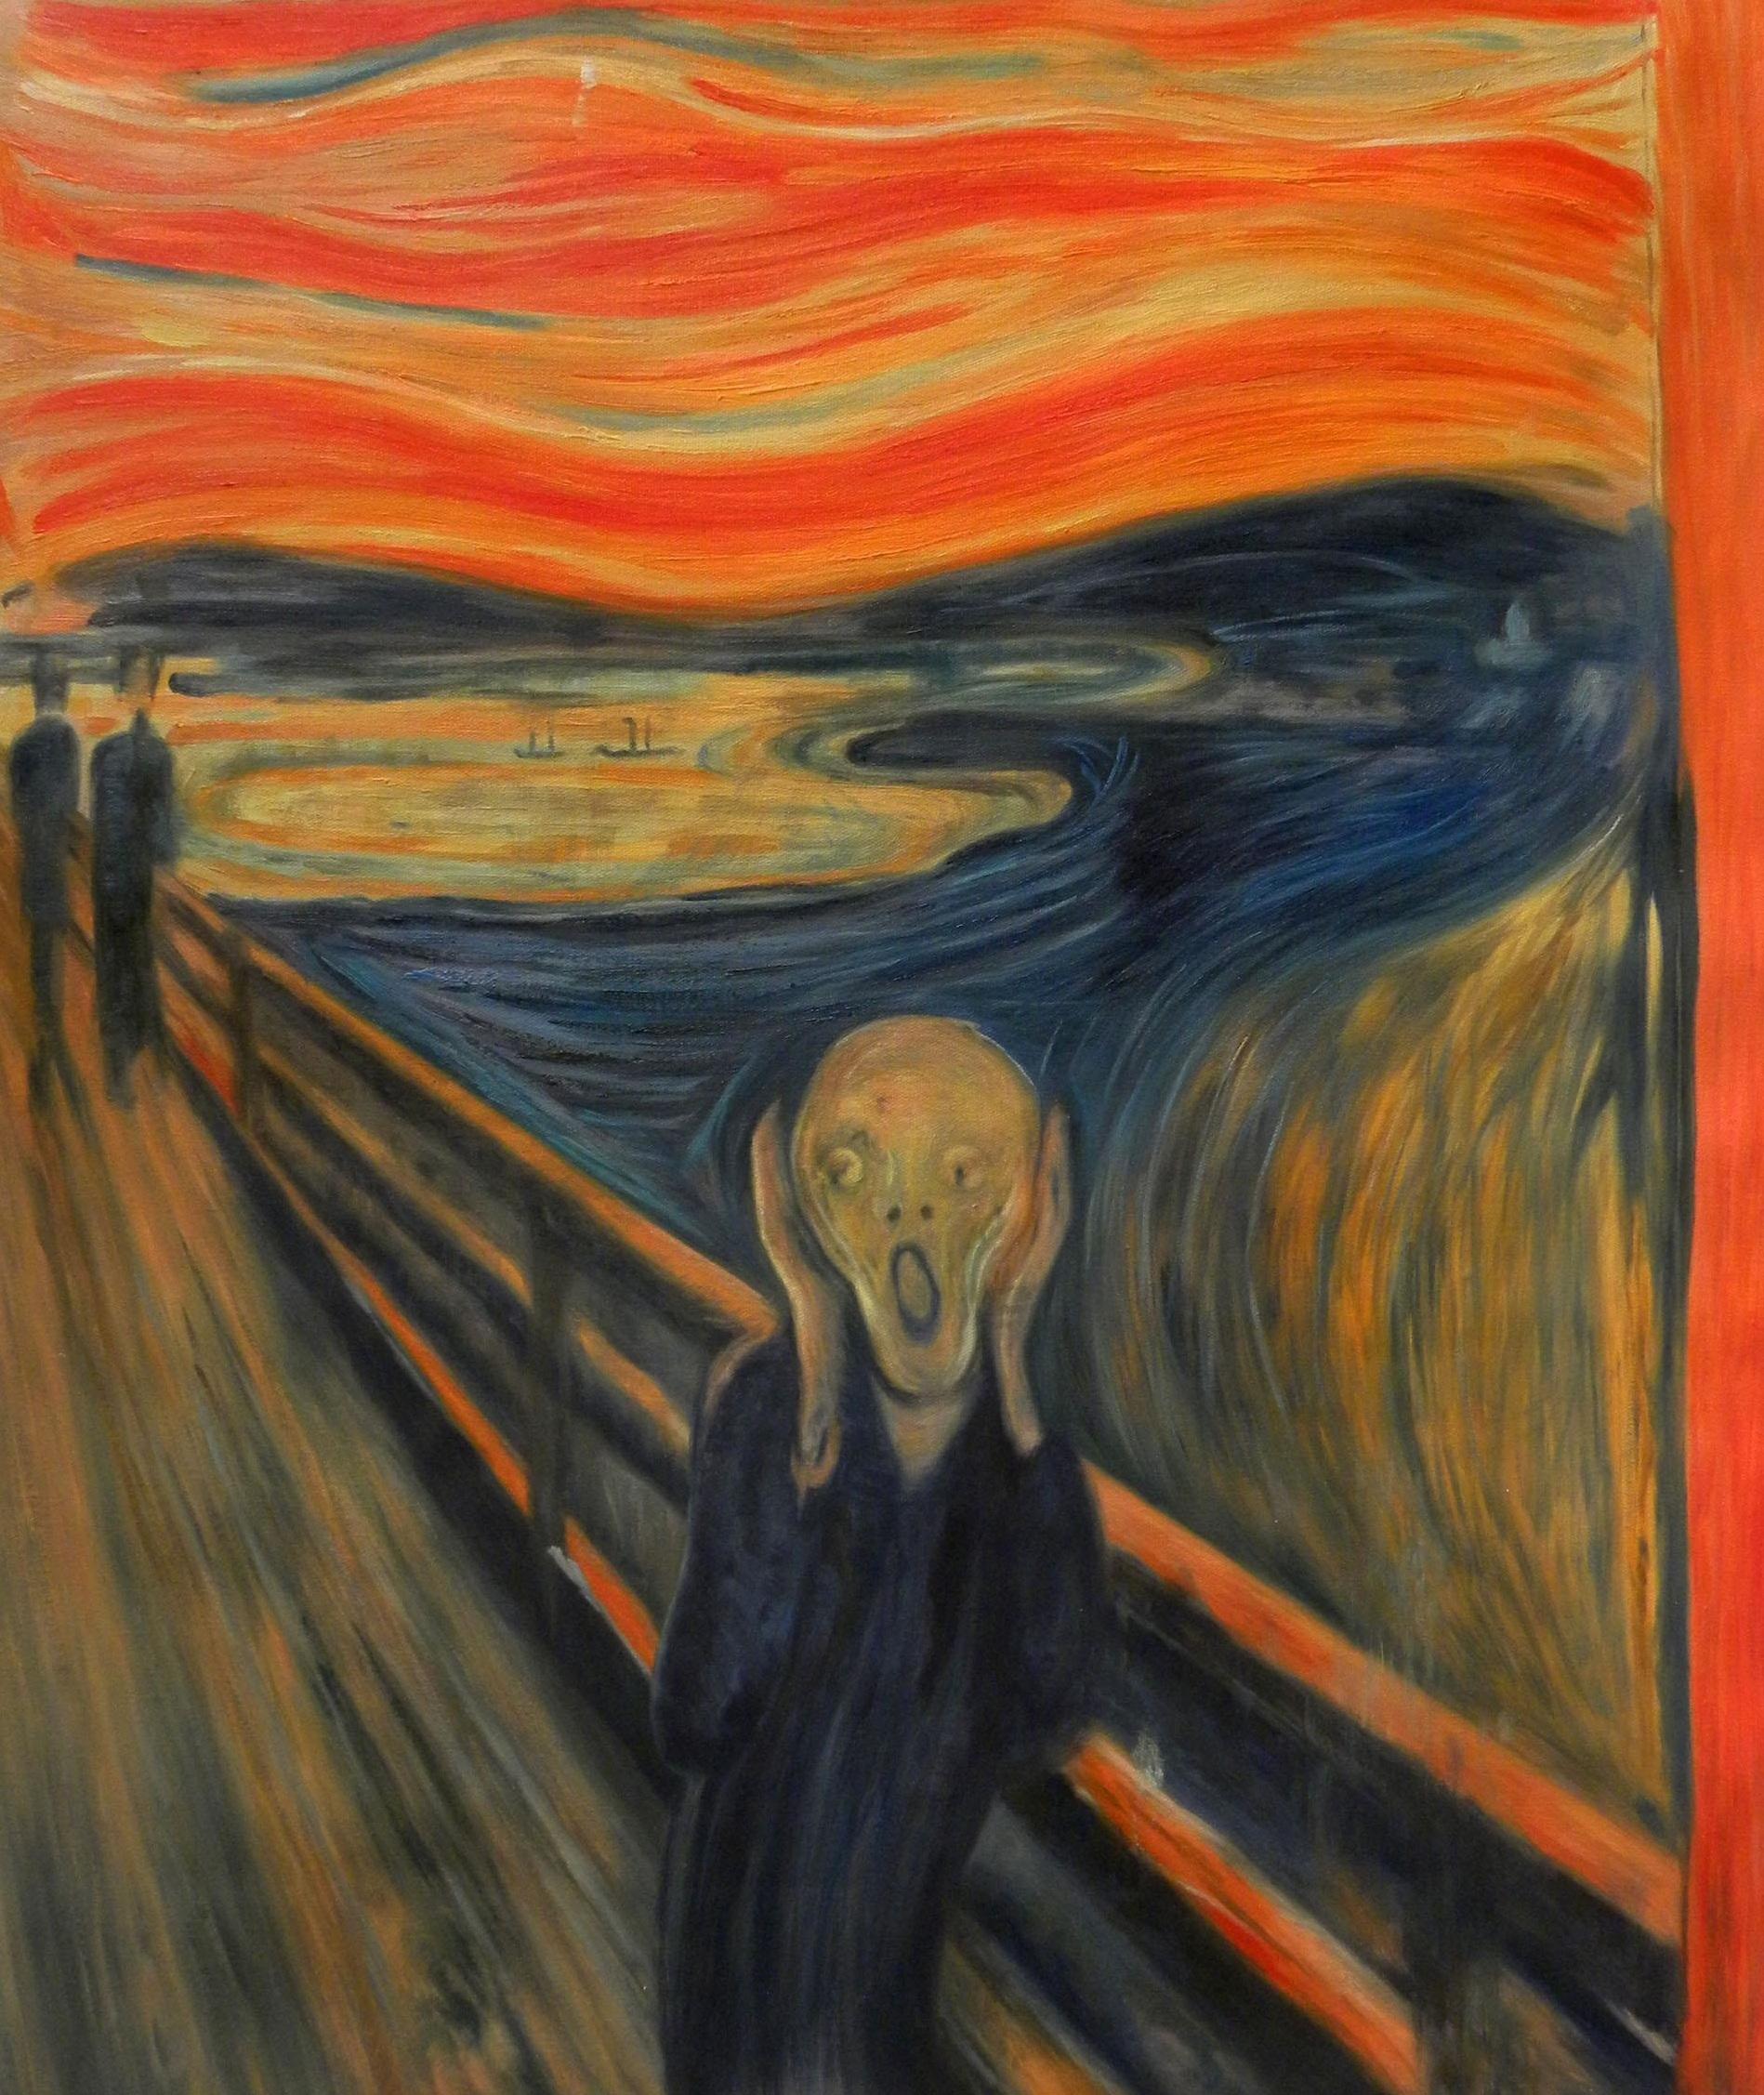 Edvard Munch | The Scream (1893)